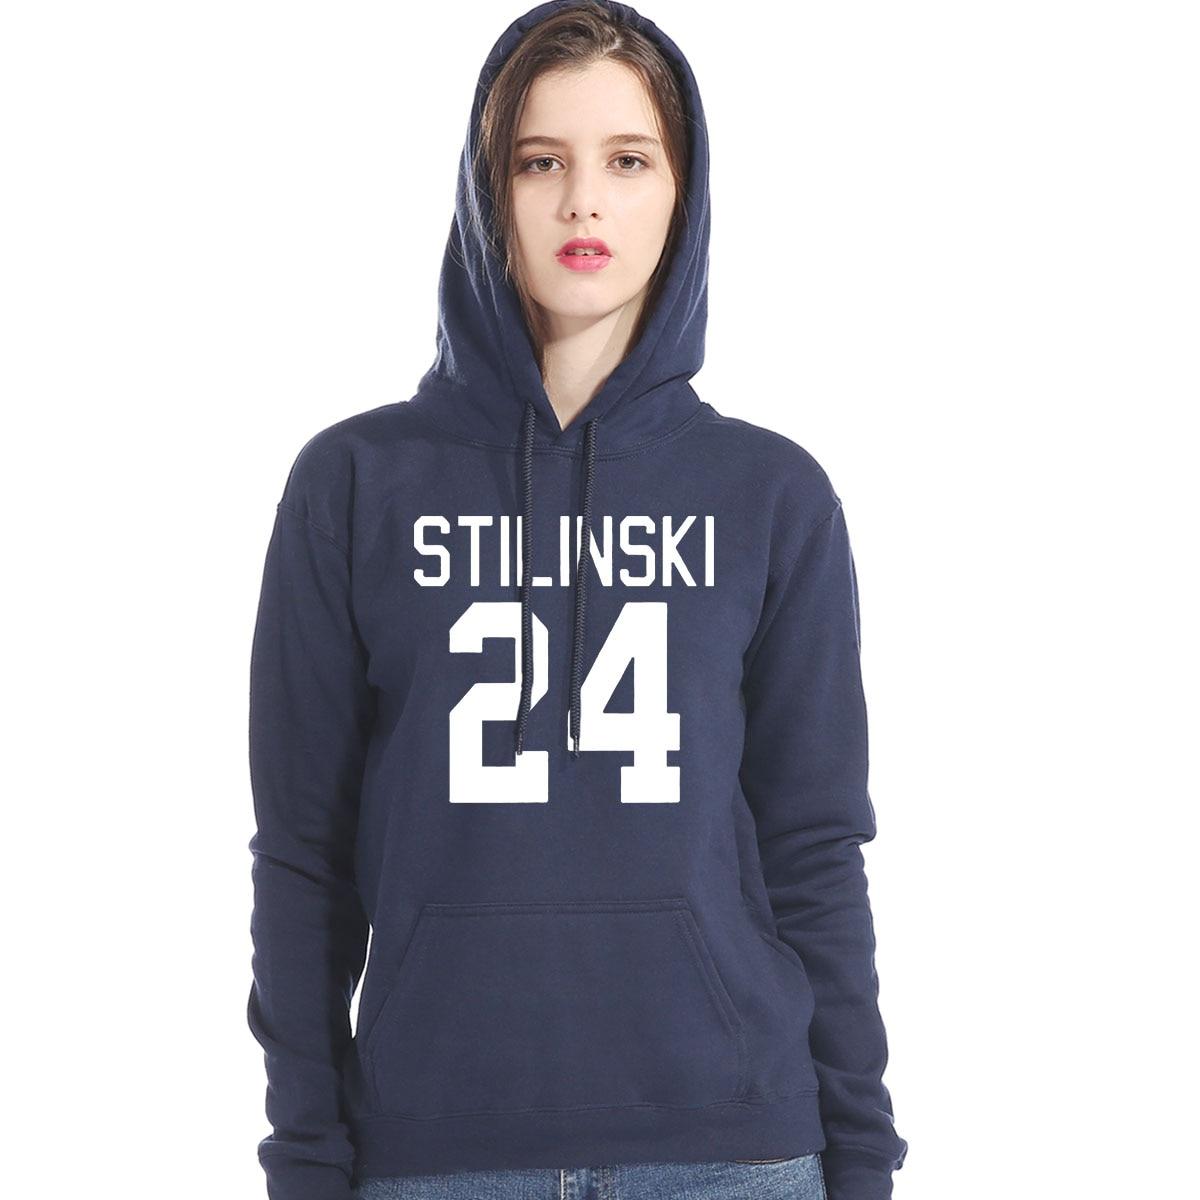 2019 Autumn Winter Long Sleeve Sweatshirt For Women Hoody Hip Hop Streetwear Coat Letter Print Gothic Women's Hoodies Kpop Tops